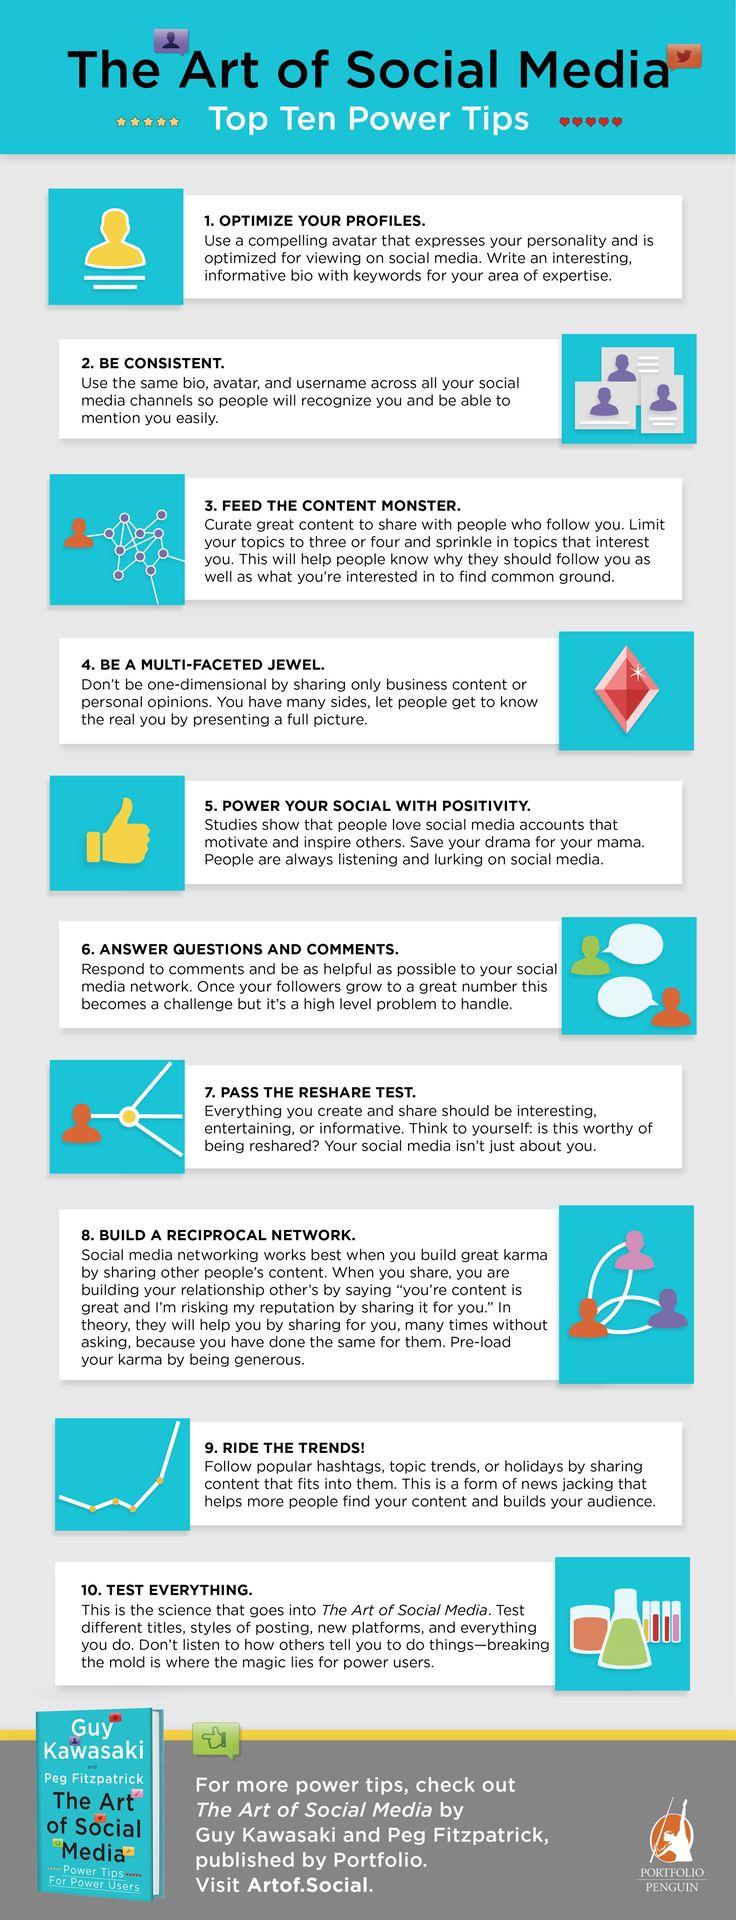 The Art Of Social Media Power Tips For Power Users Infographic Http://artof